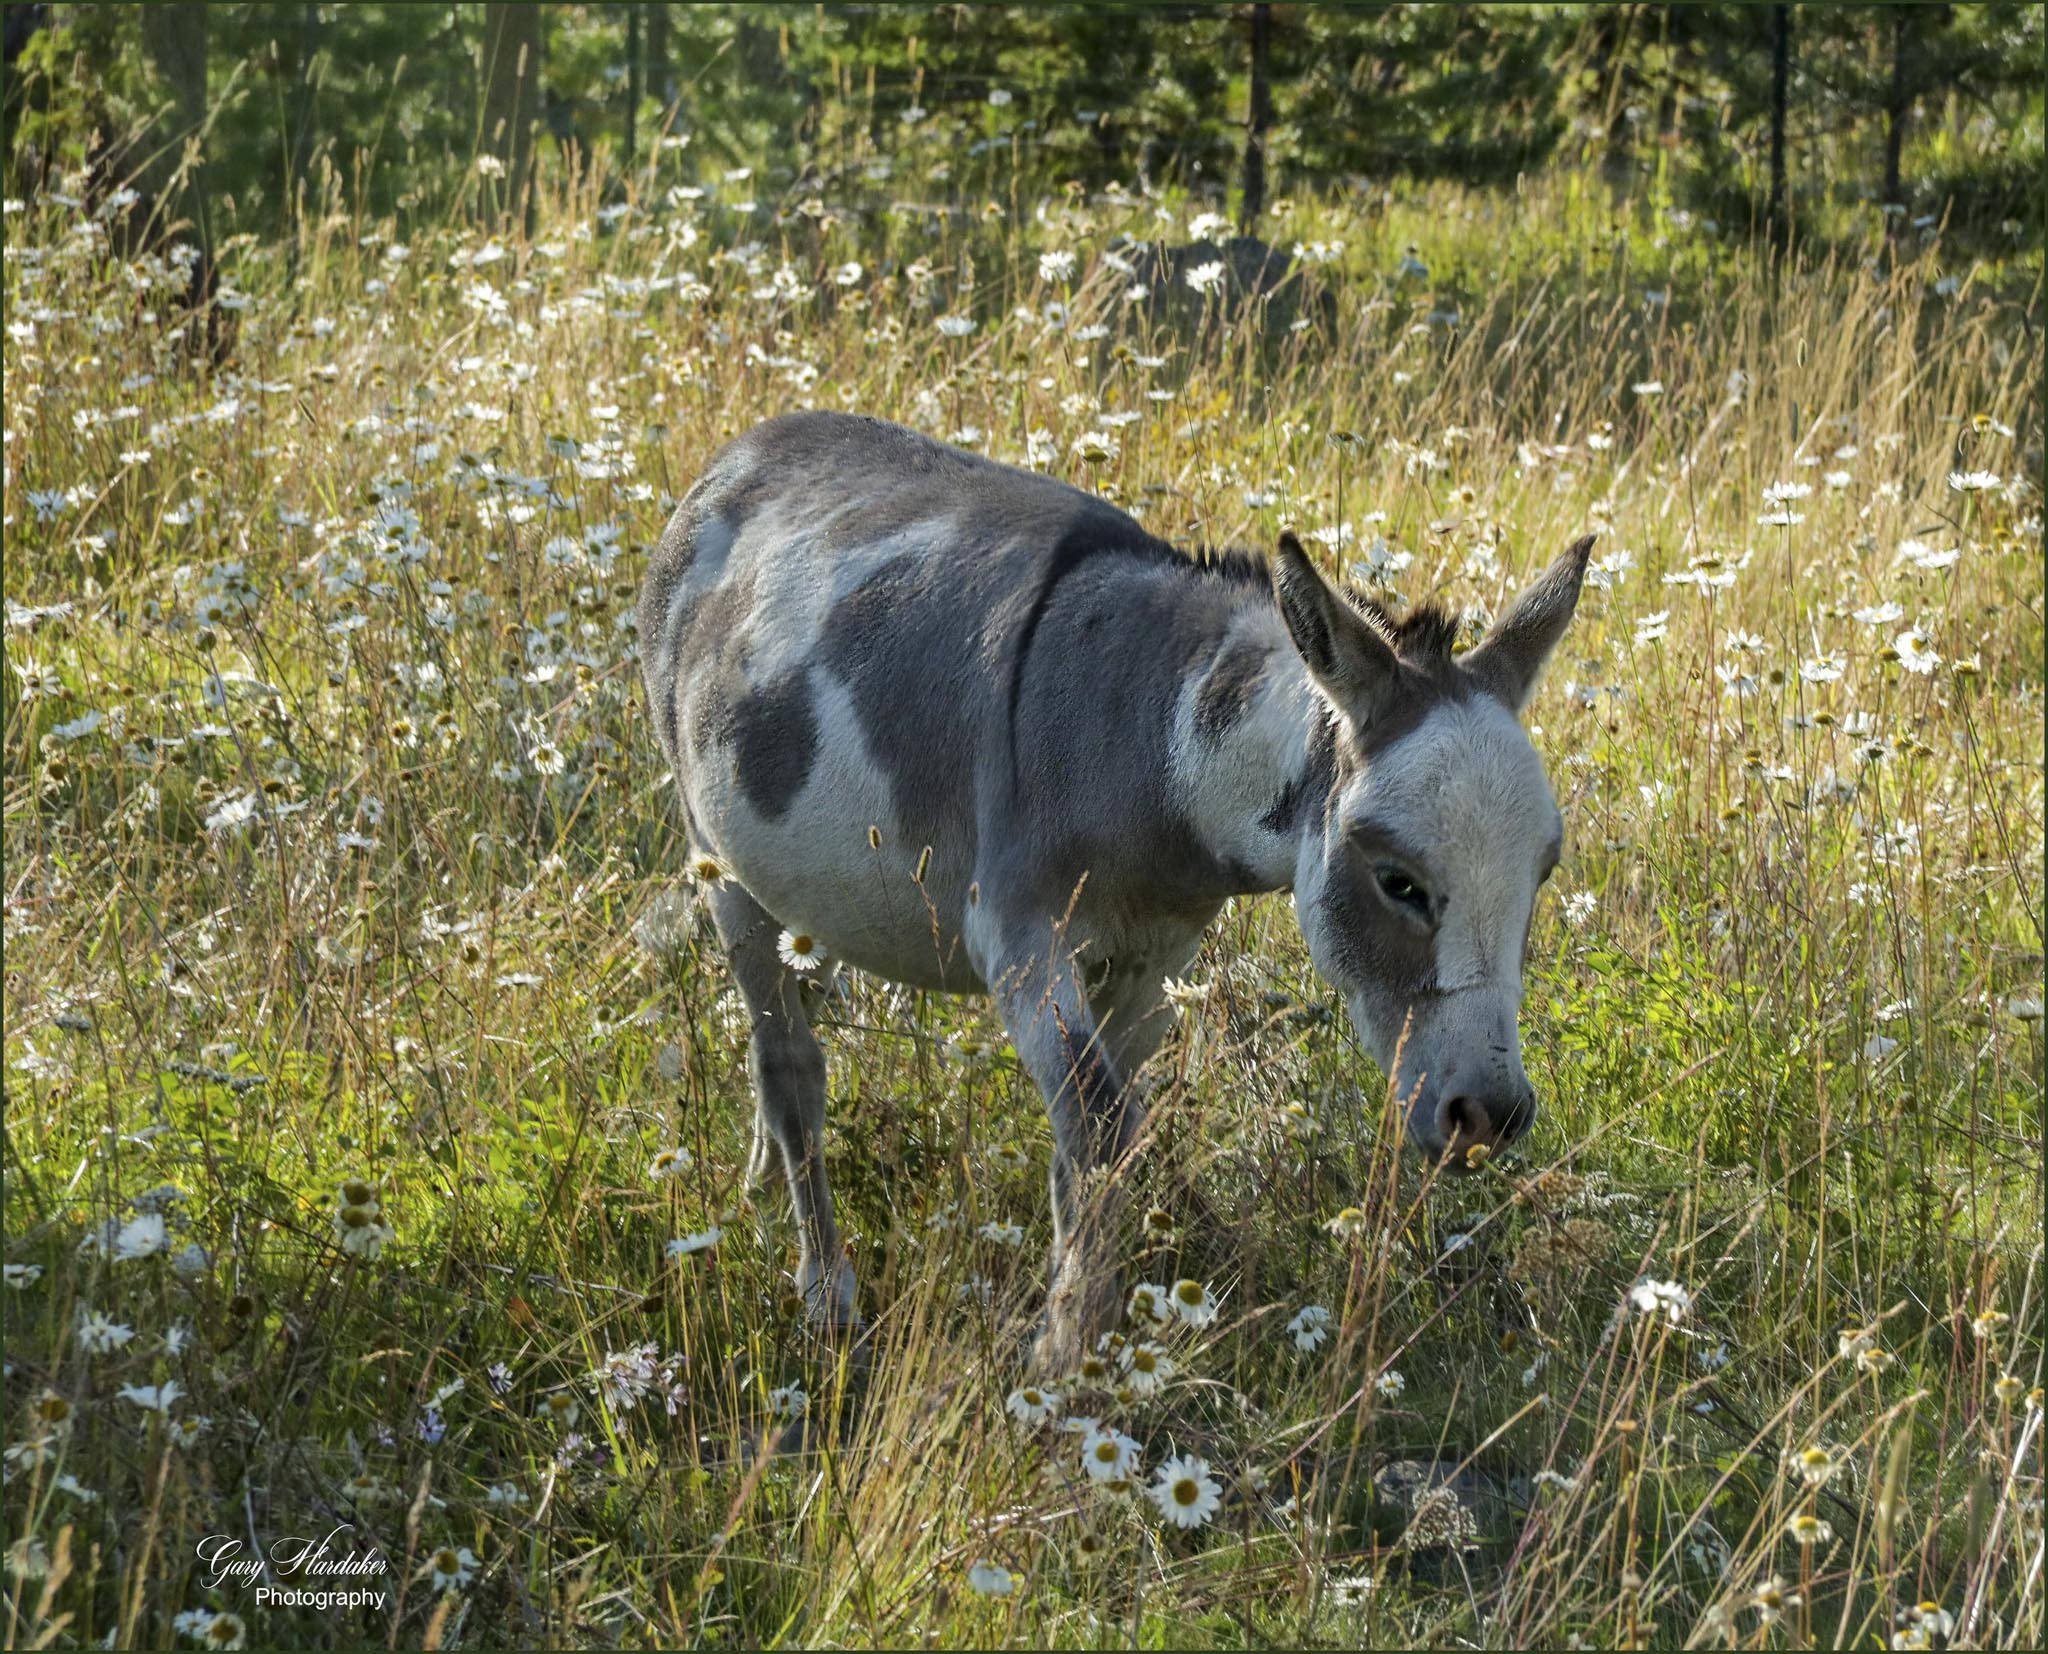 Gary Hardaker - Grazing in a Field of Daisies